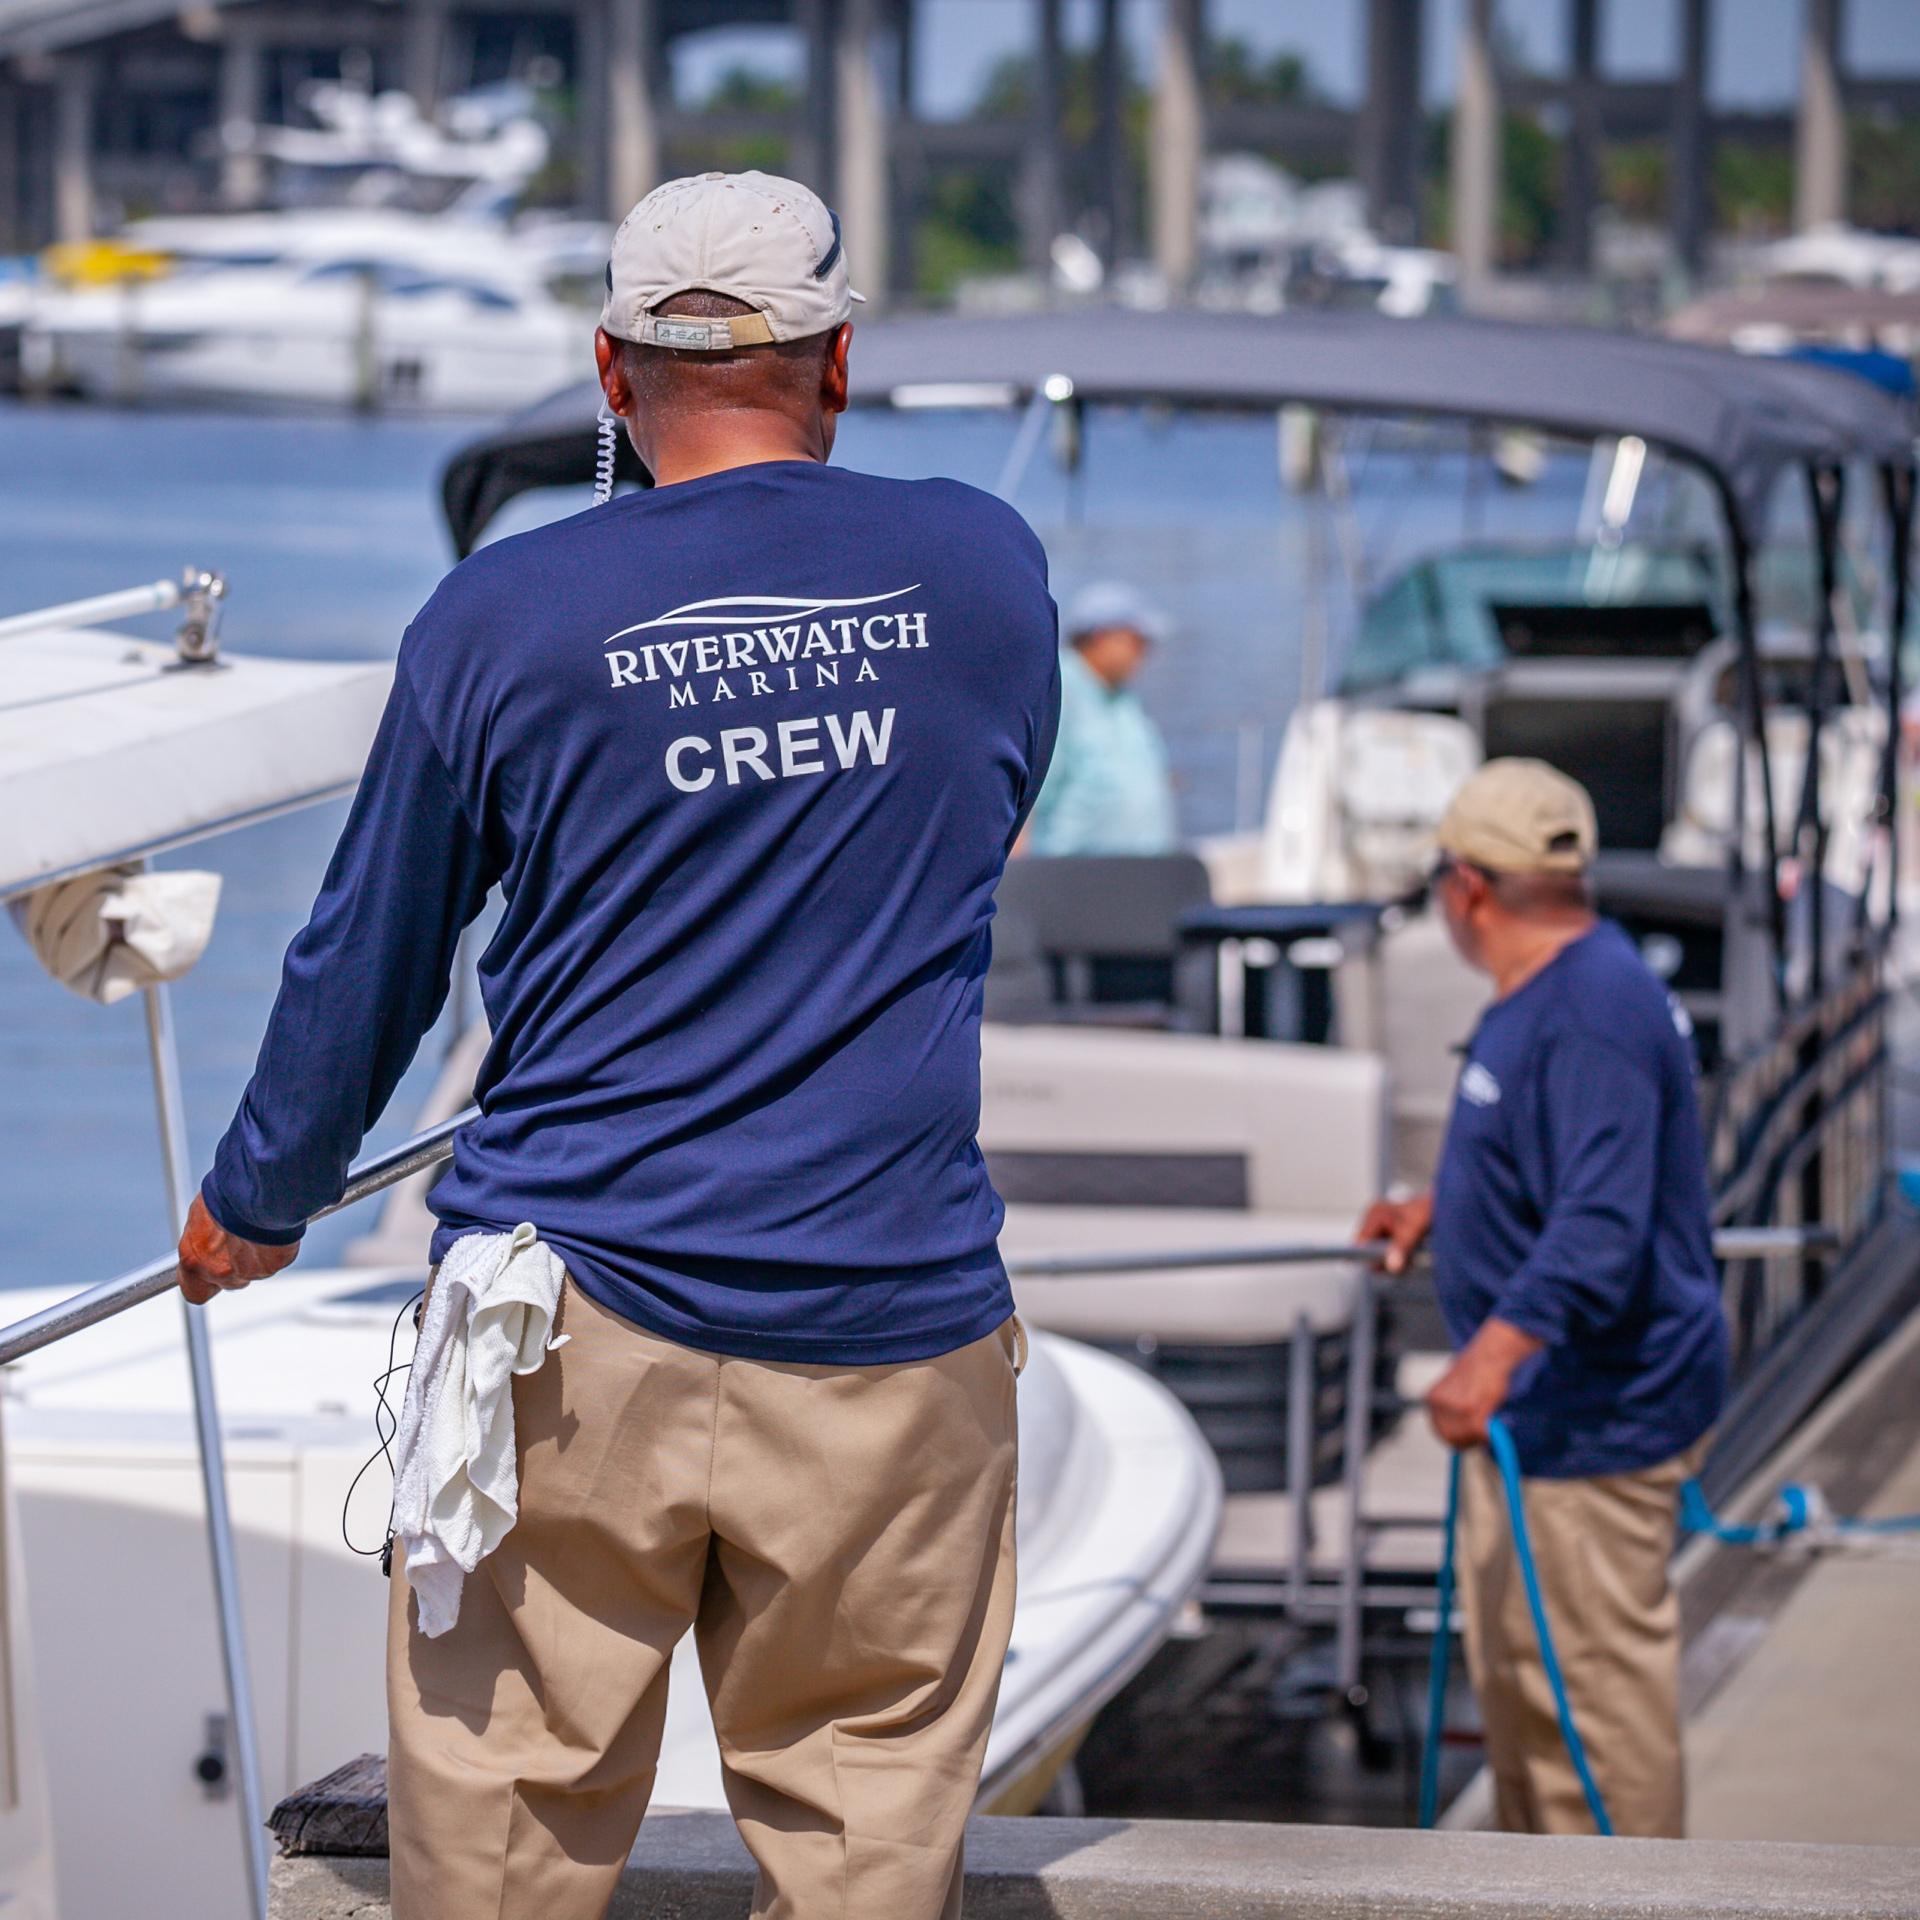 Riverwatch Dockage Crew